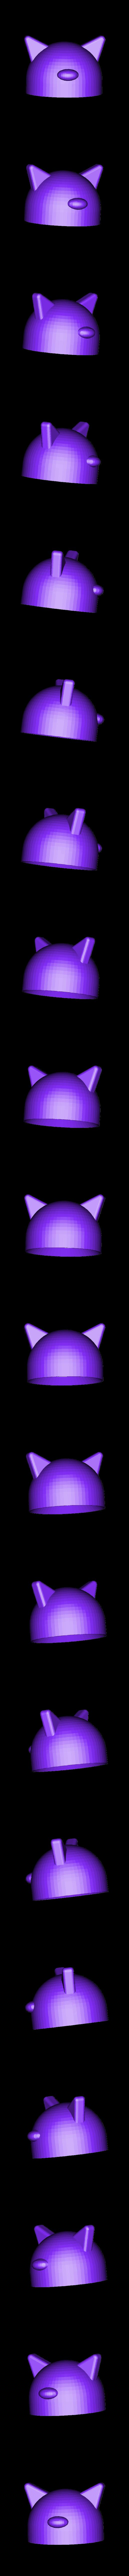 mtmk_trifix_cathead.stl Download free STL file 3D Monstamaka • 3D printing design, mageli